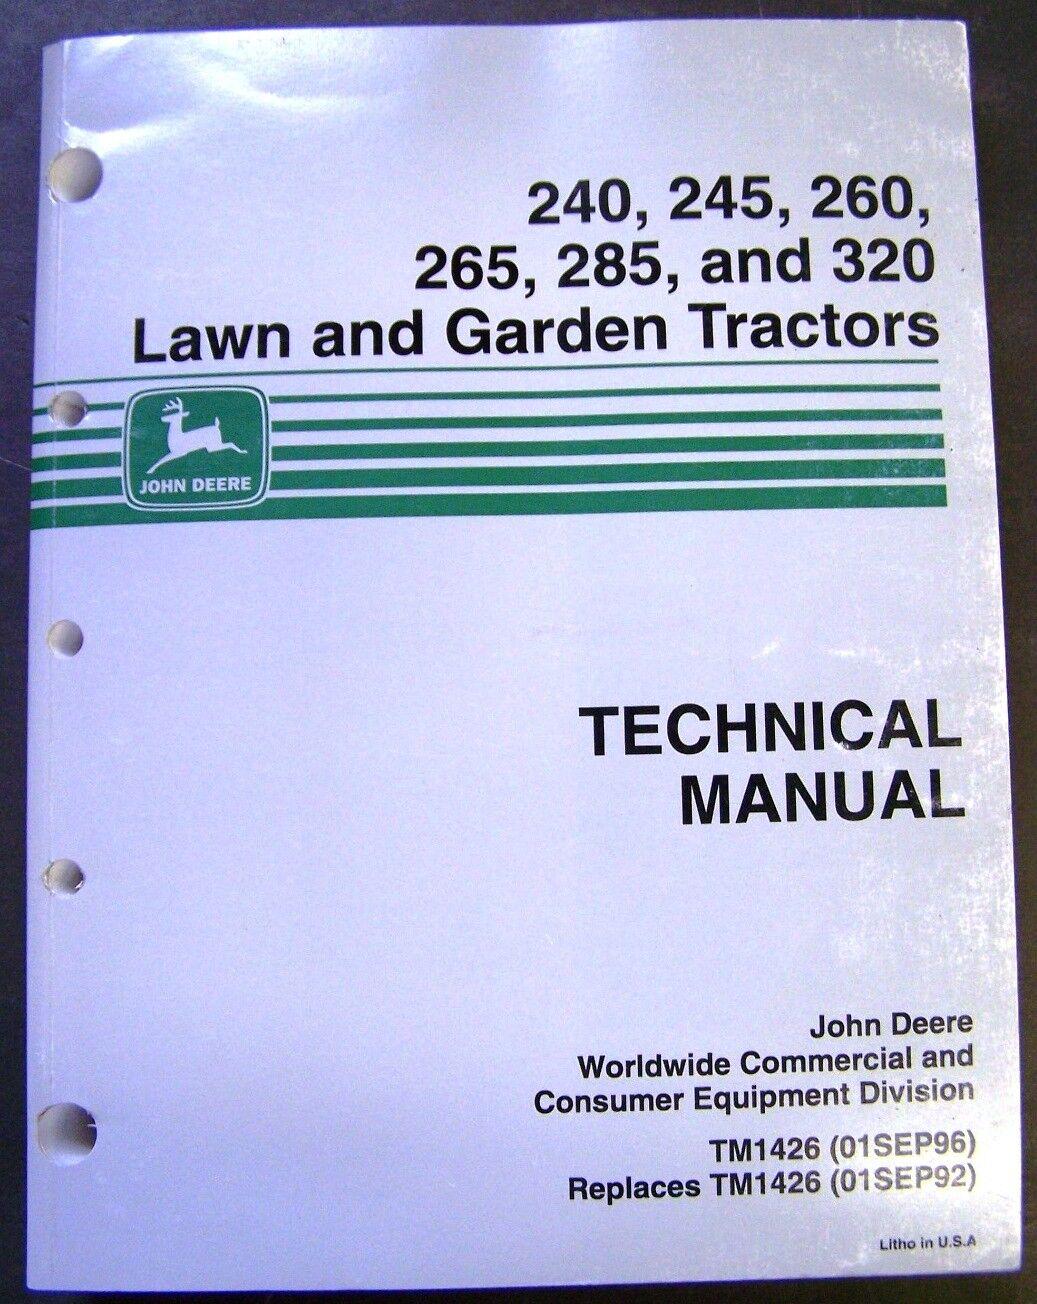 John Deere Models 240-245-260-265-285-320 Lawn Tractors Technical Service  Manual | eBay